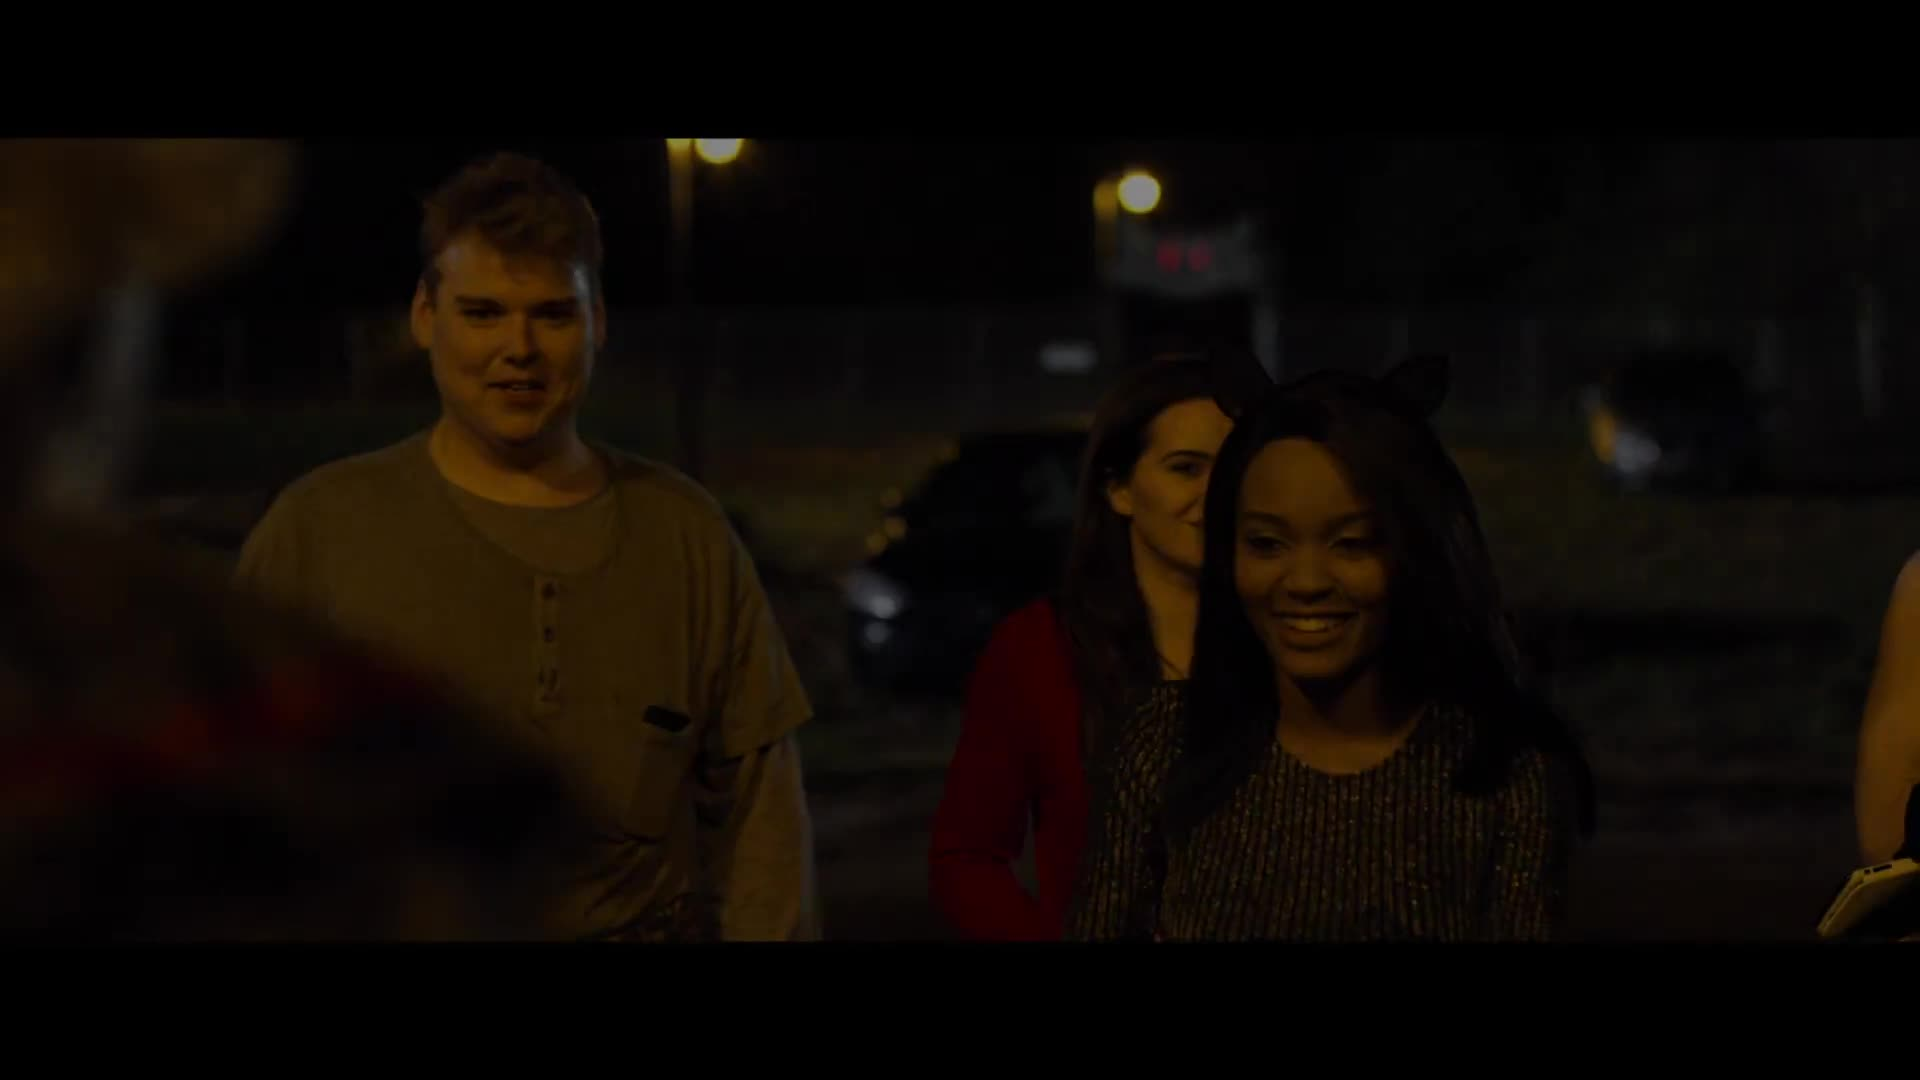 Haunt - Official Trailer [HD] screen capture